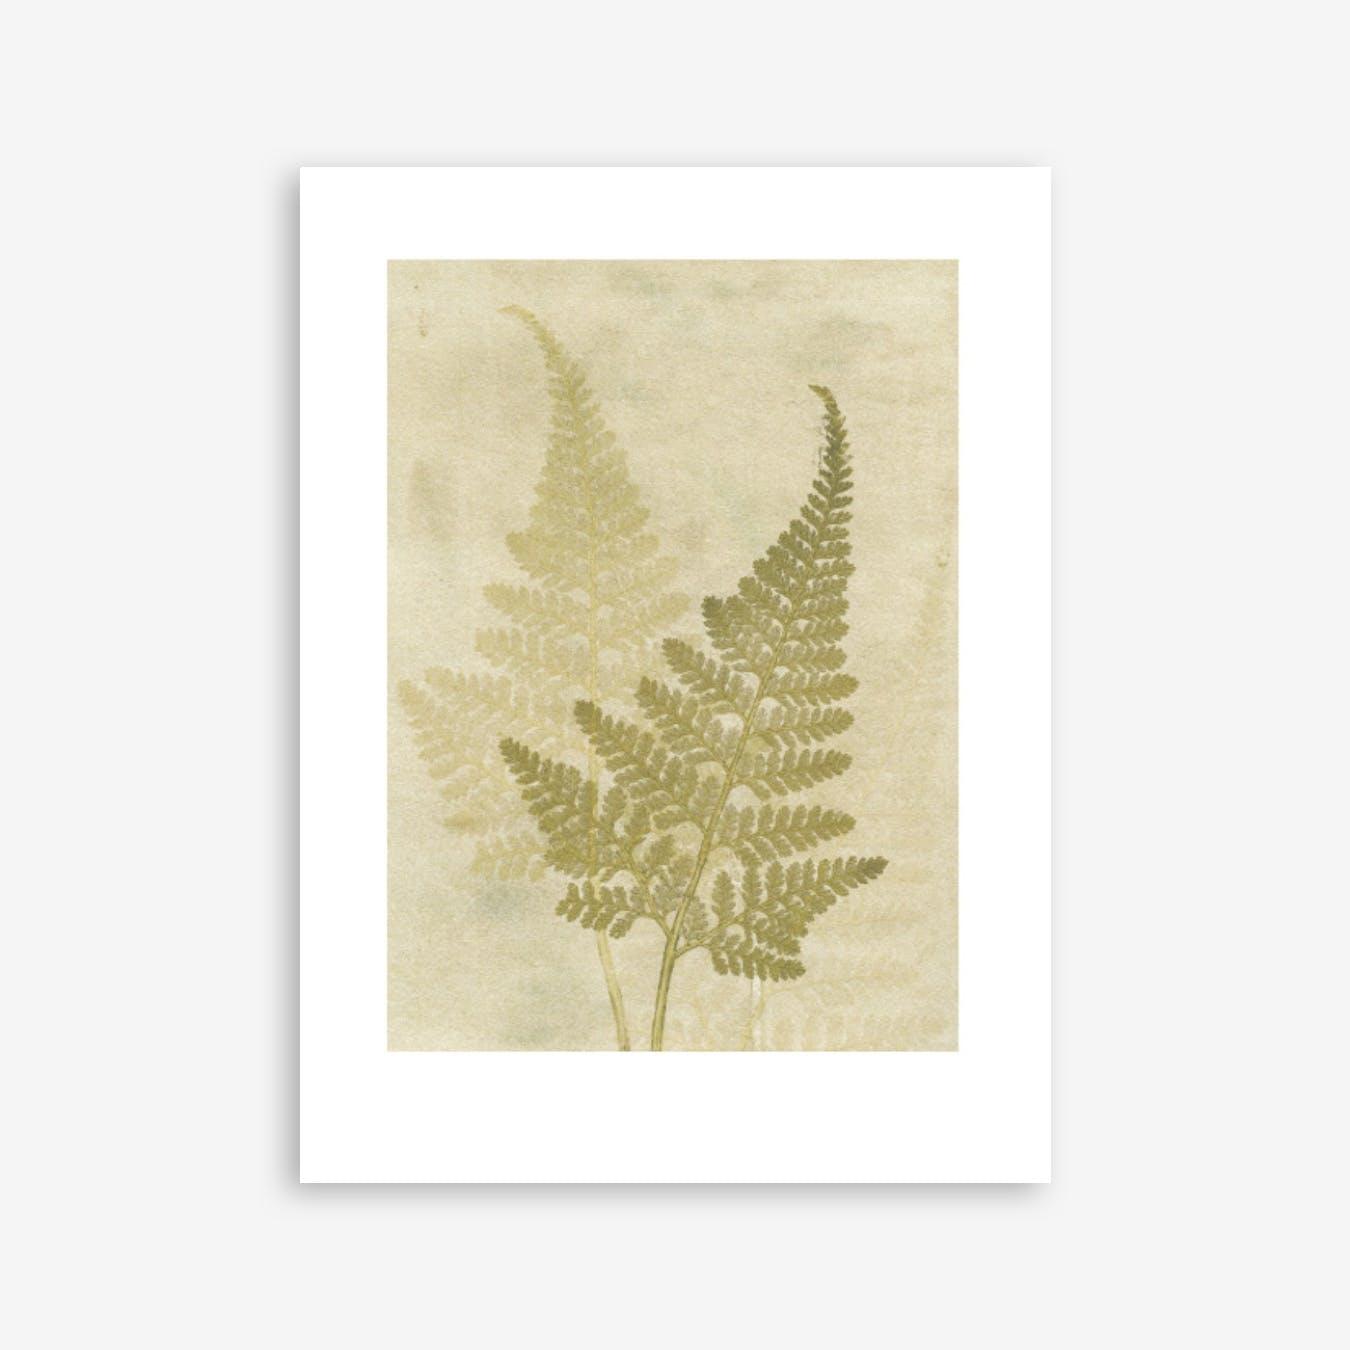 Fern Olive Print In 30cm x 40cm